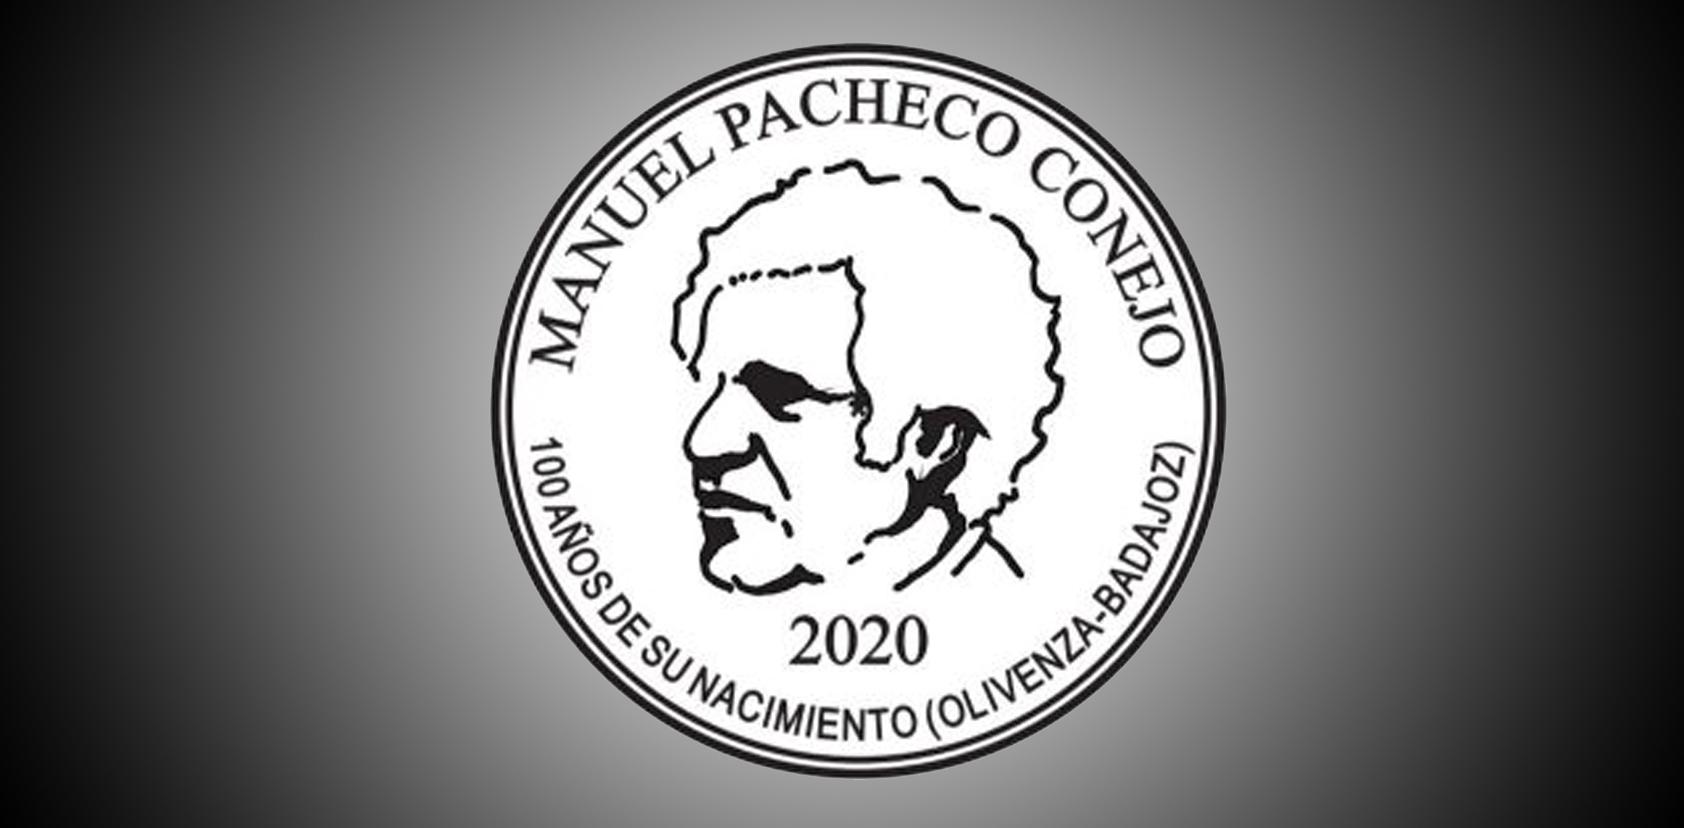 Manuel Pacheco 2020